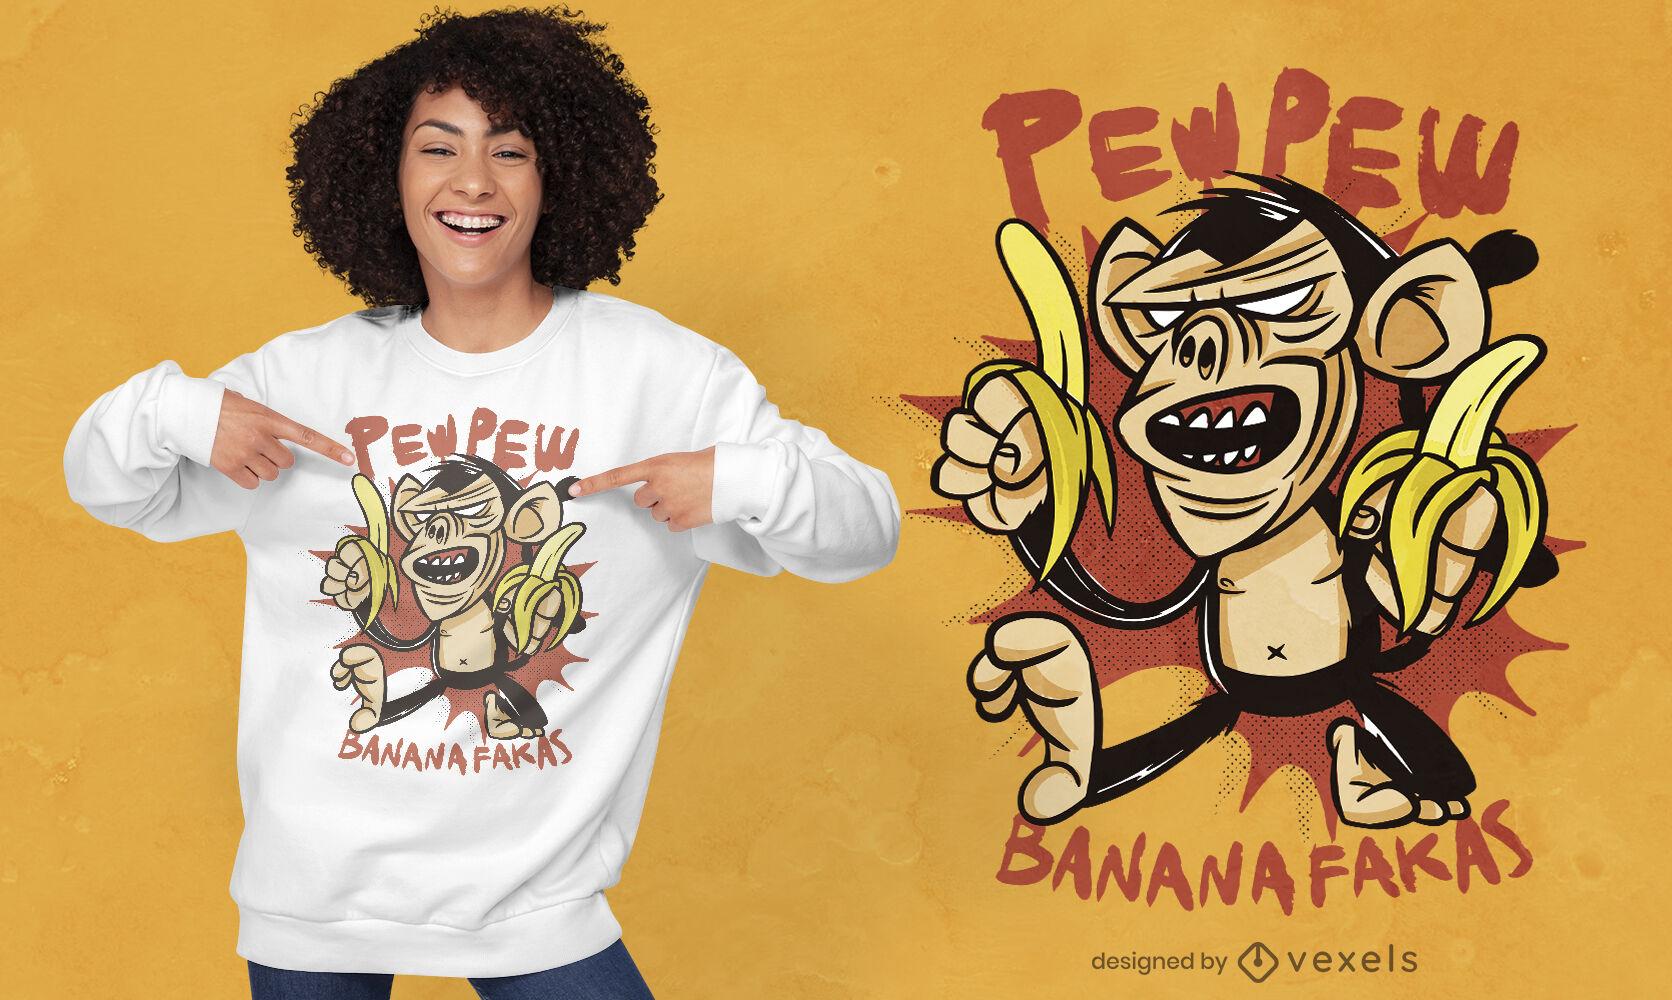 Wütendes Cartoon-Affen-Tier-T-Shirt-Design